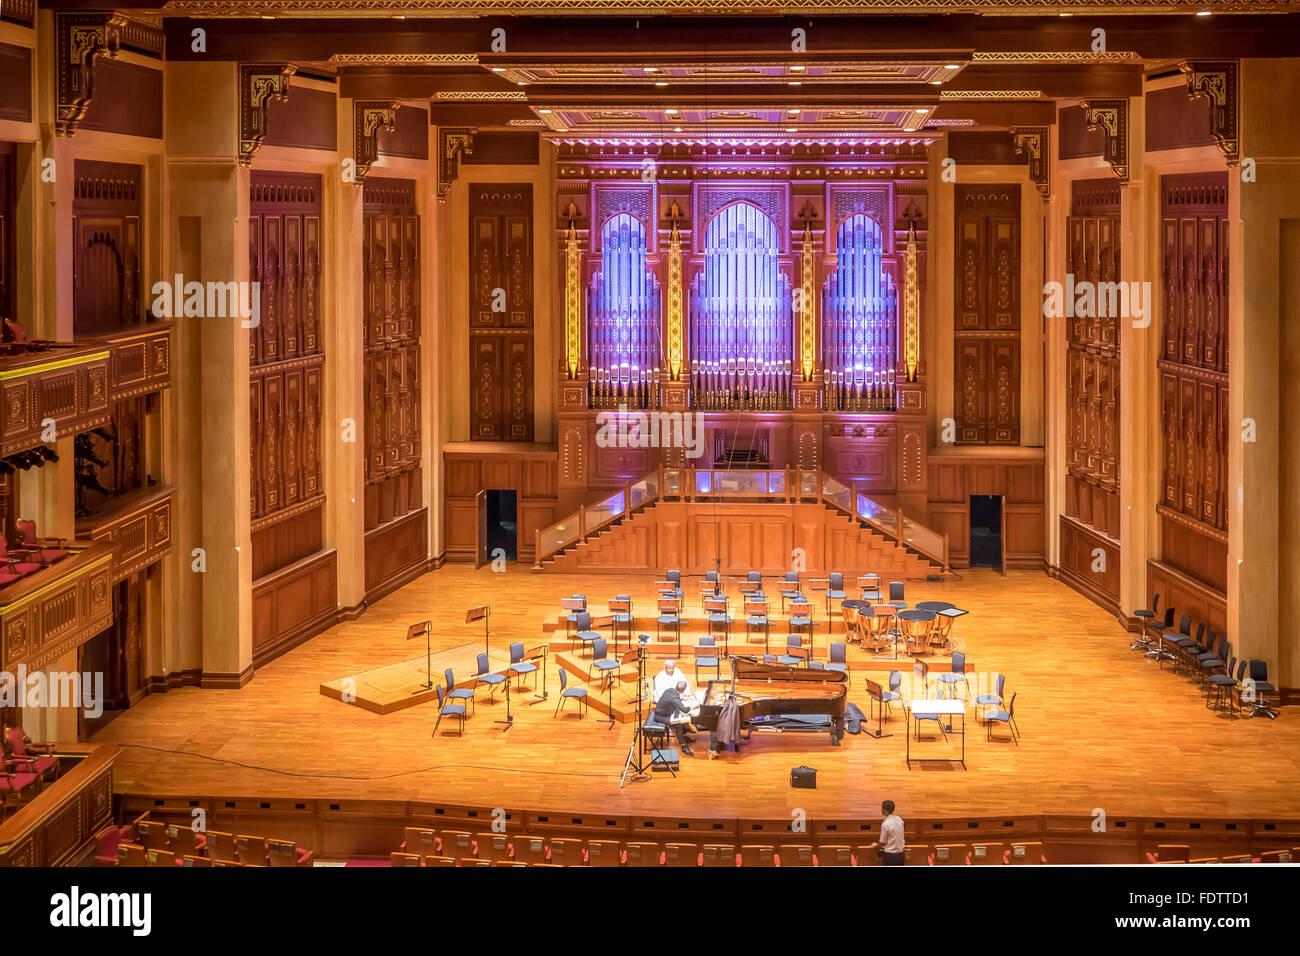 Oman, Muscat, Royal Opera House, stage - Stock Image